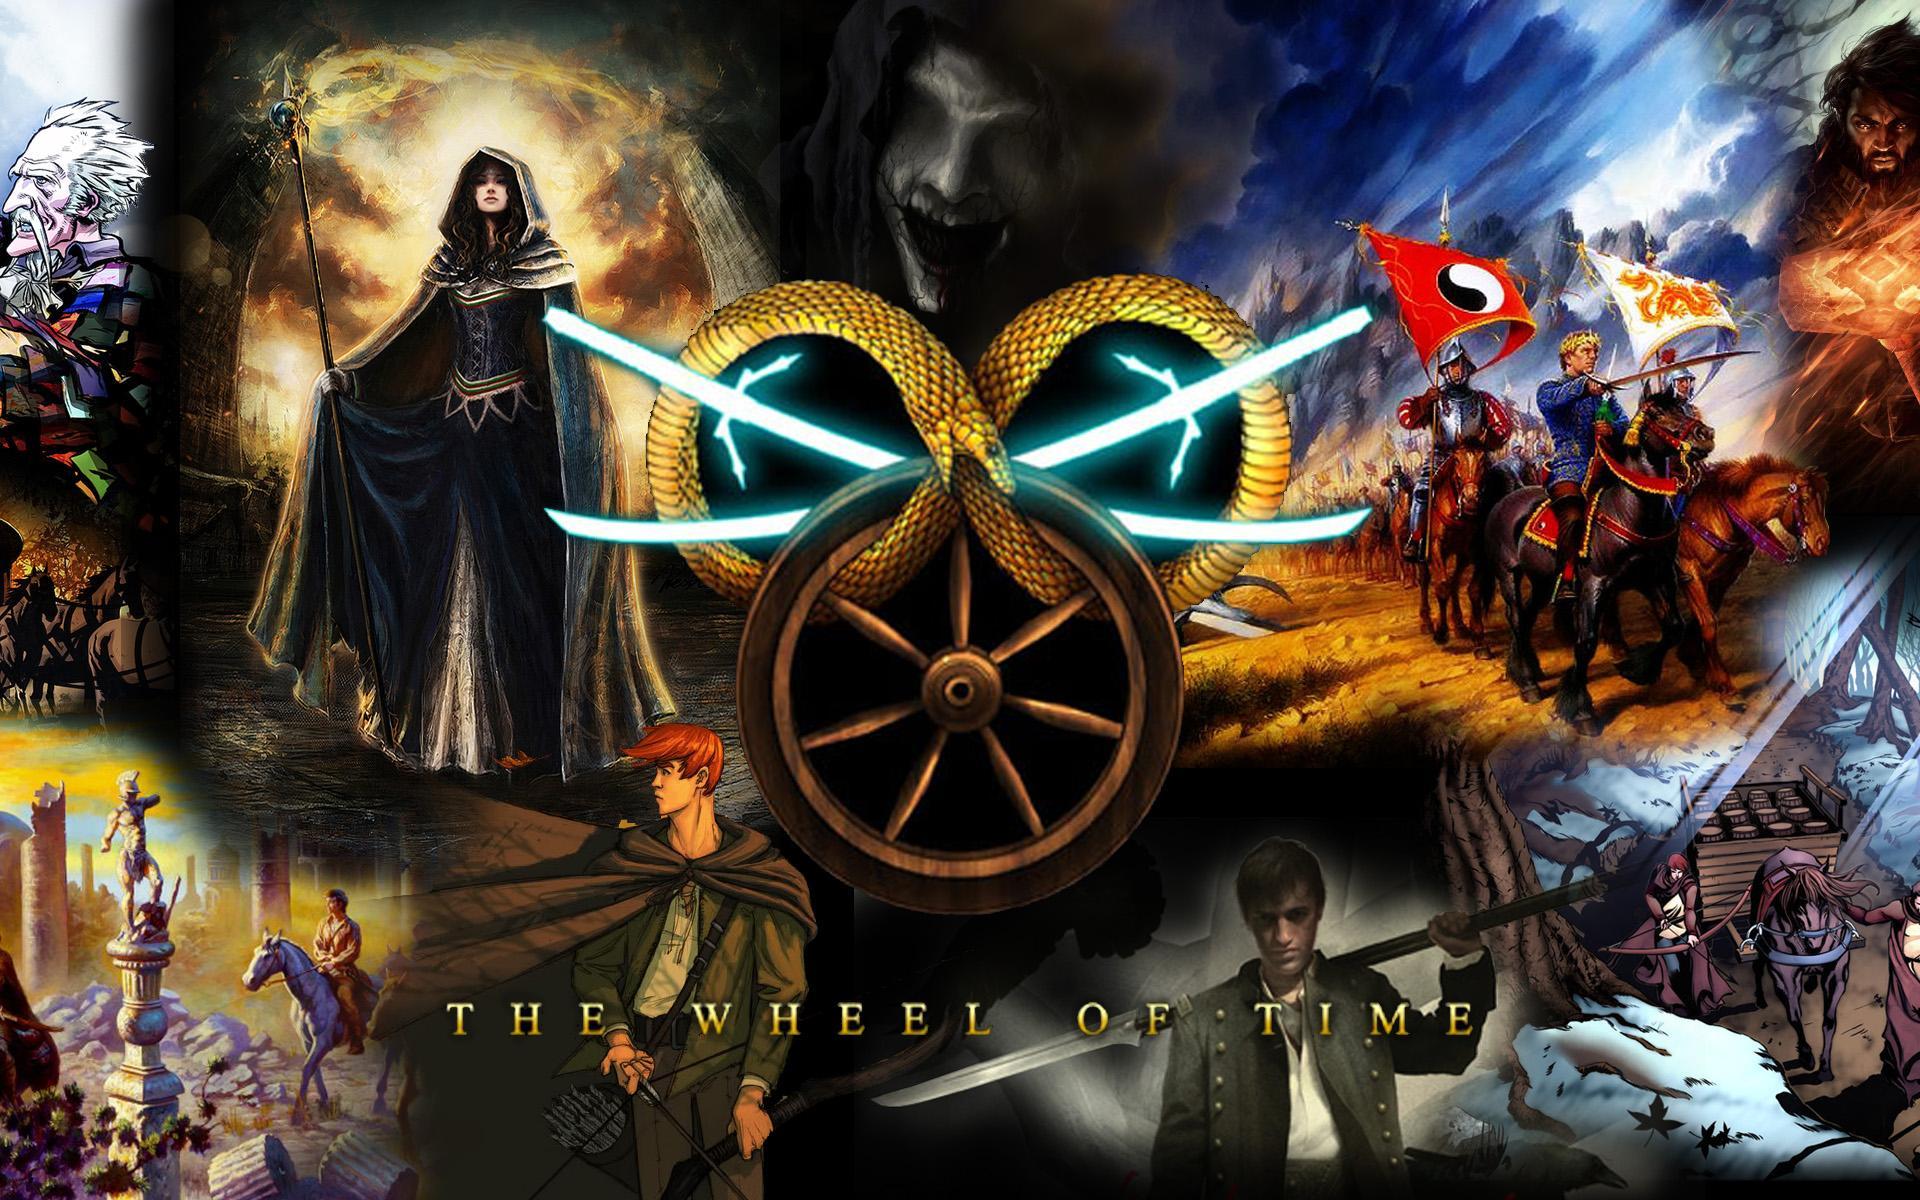 Wheel Of Time Desktop 1362413 Hd Wallpaper Backgrounds Download